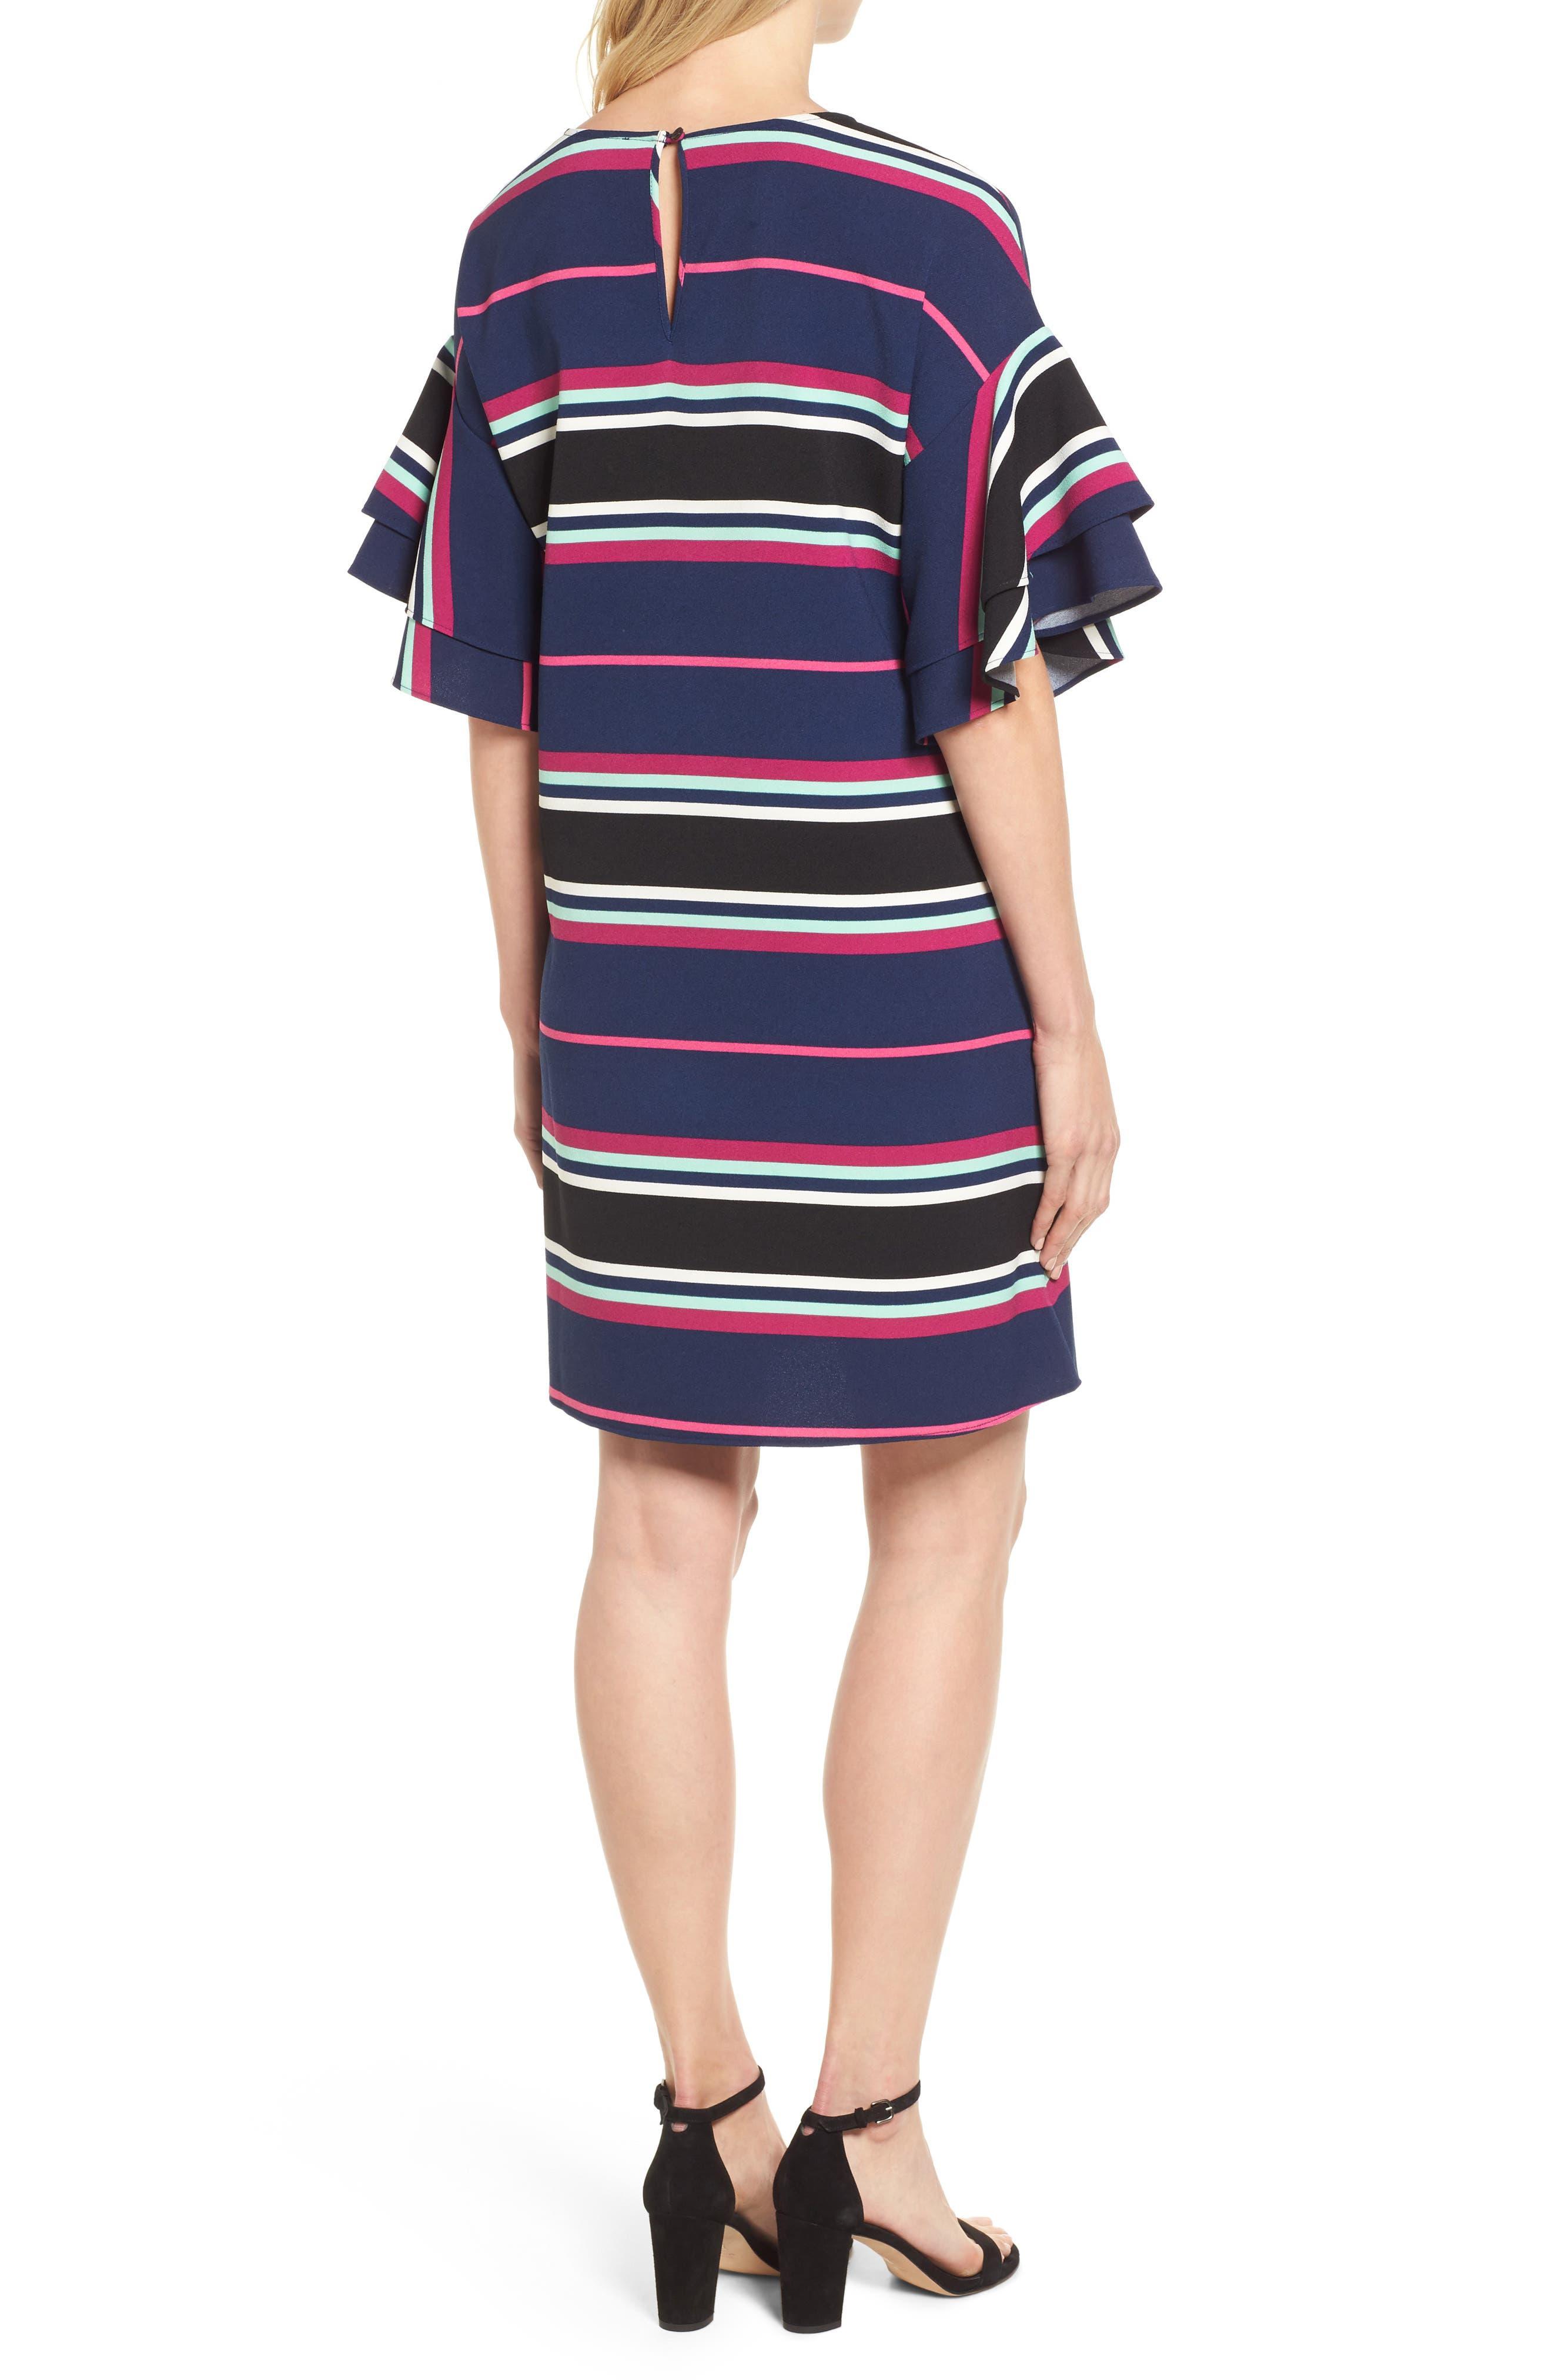 Ruffle Sleeve Shift Dress,                             Alternate thumbnail 2, color,                             Navy- Pink Multi Stripe